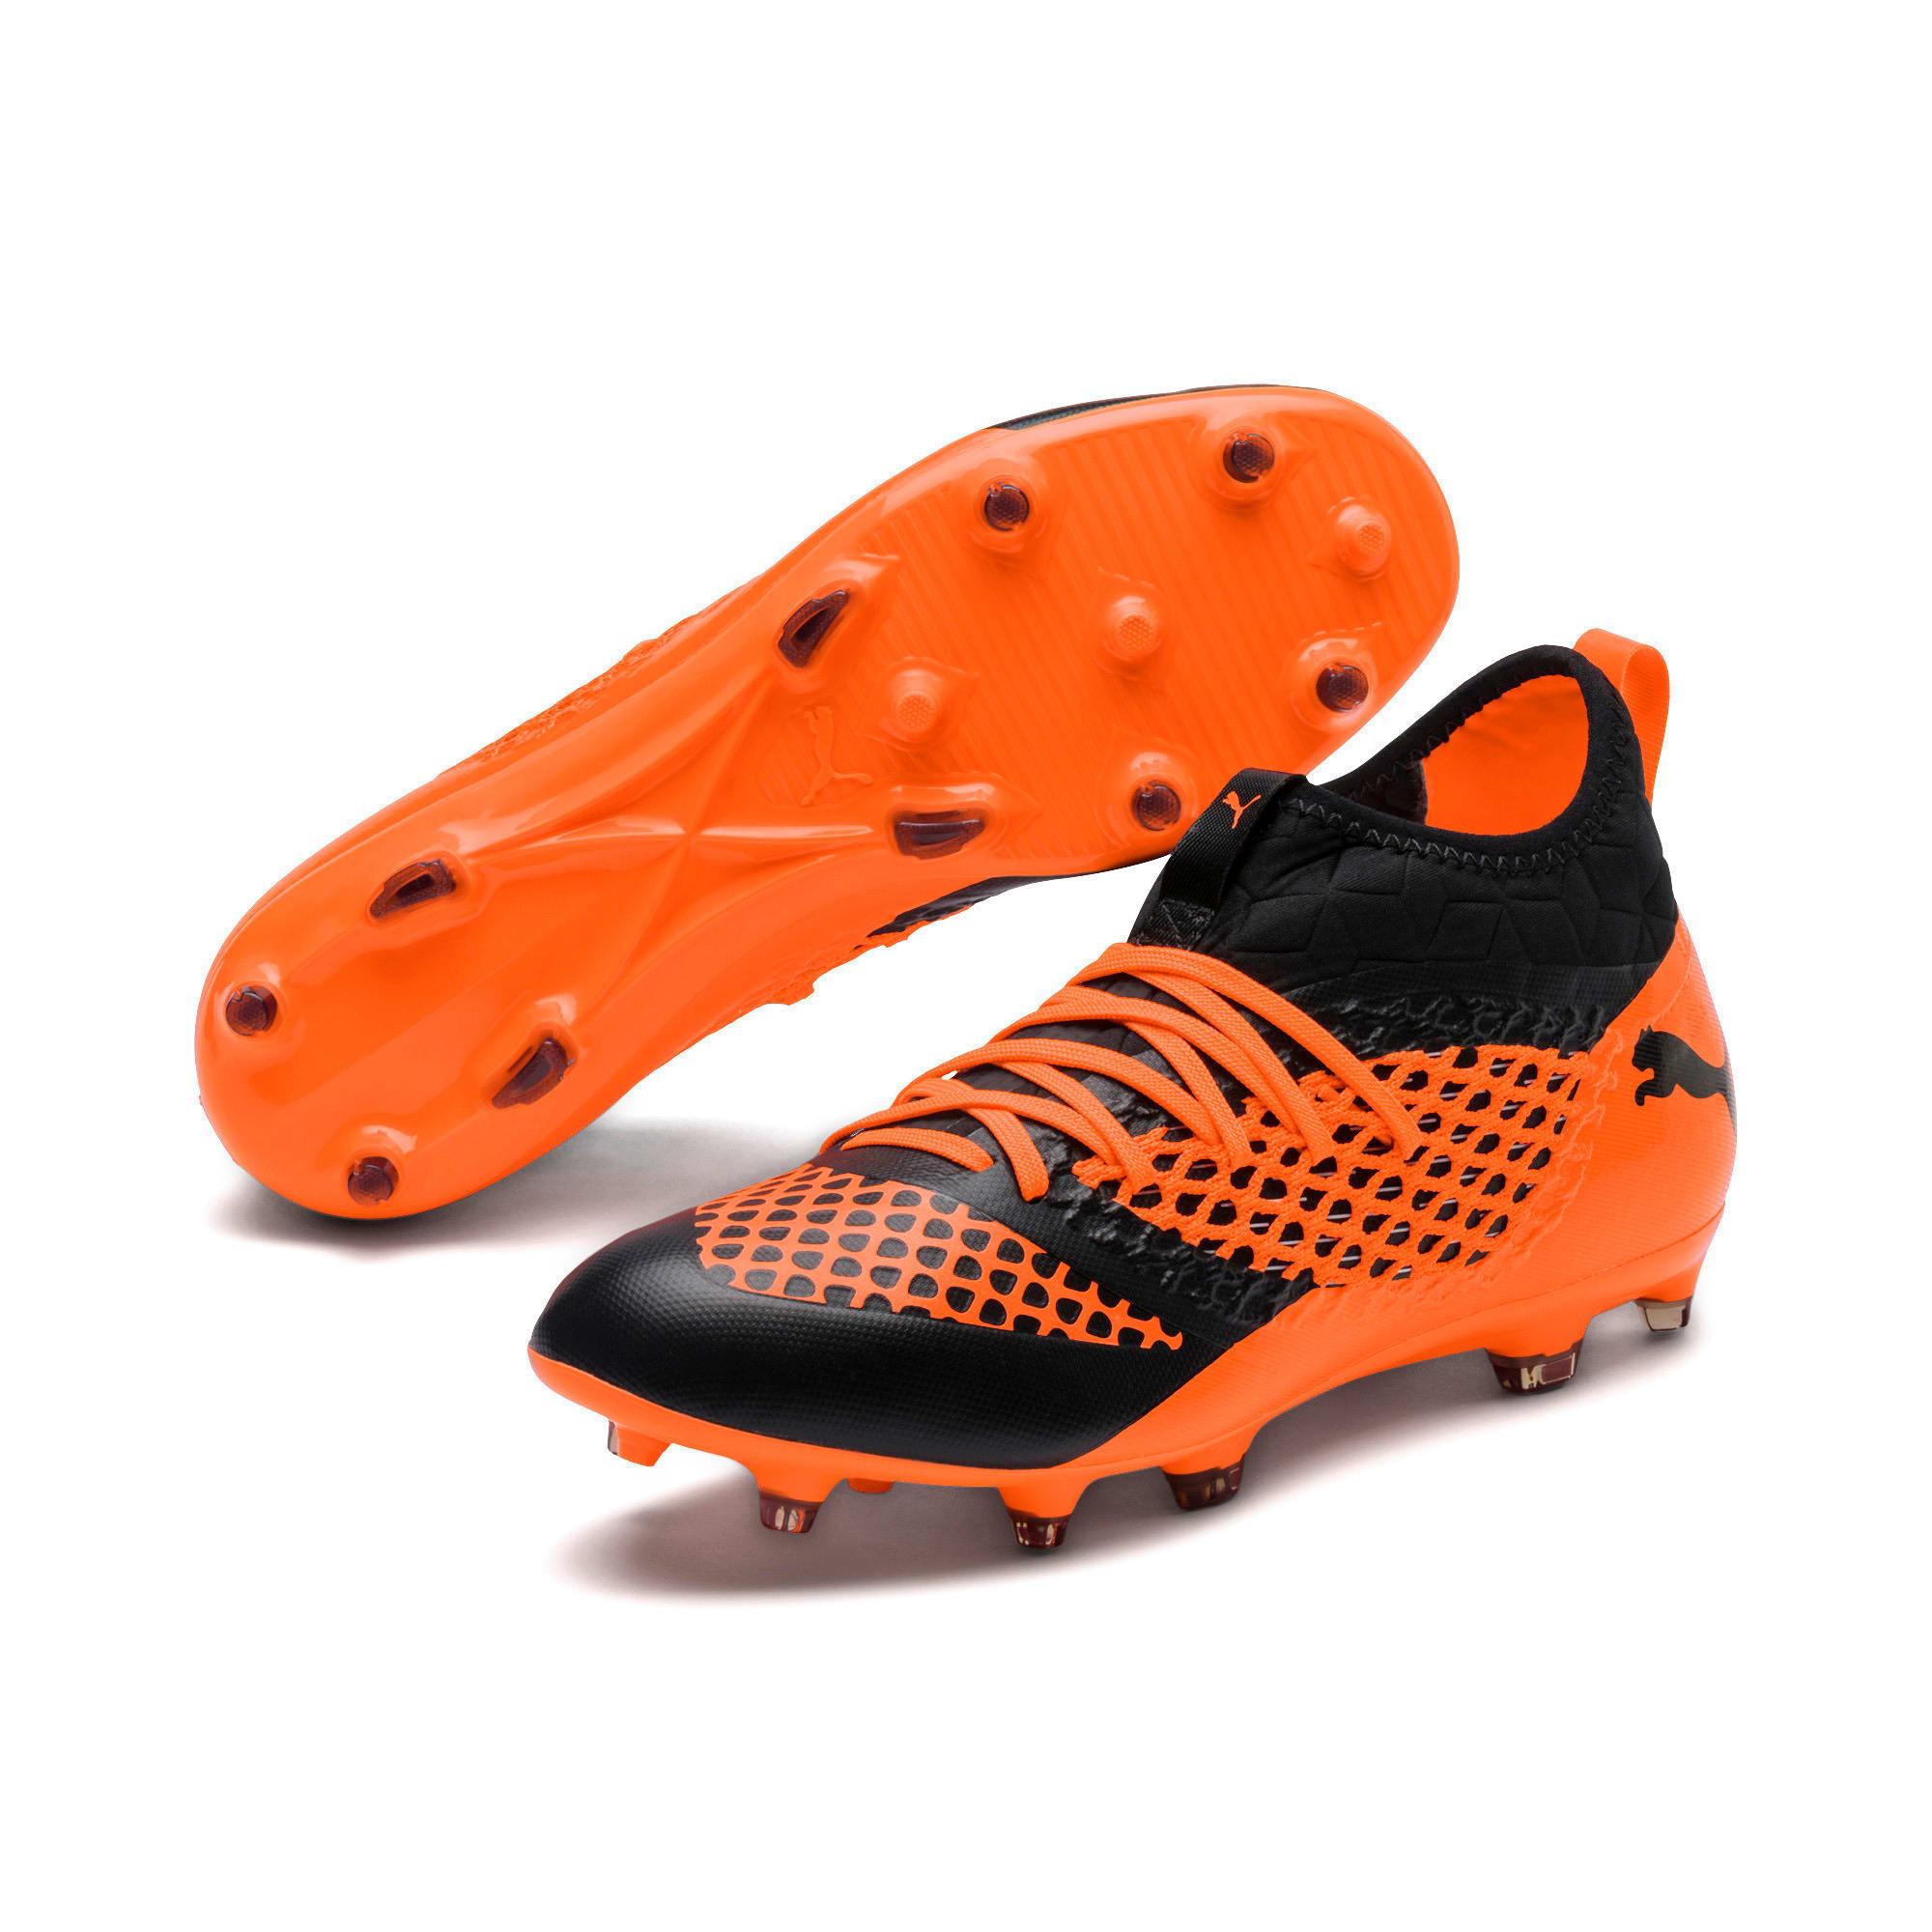 Thumbnail 4 of FUTURE 2.3 NETFIT FG/AG  Football Boots, Puma Black-Shocking Orange, medium-IND